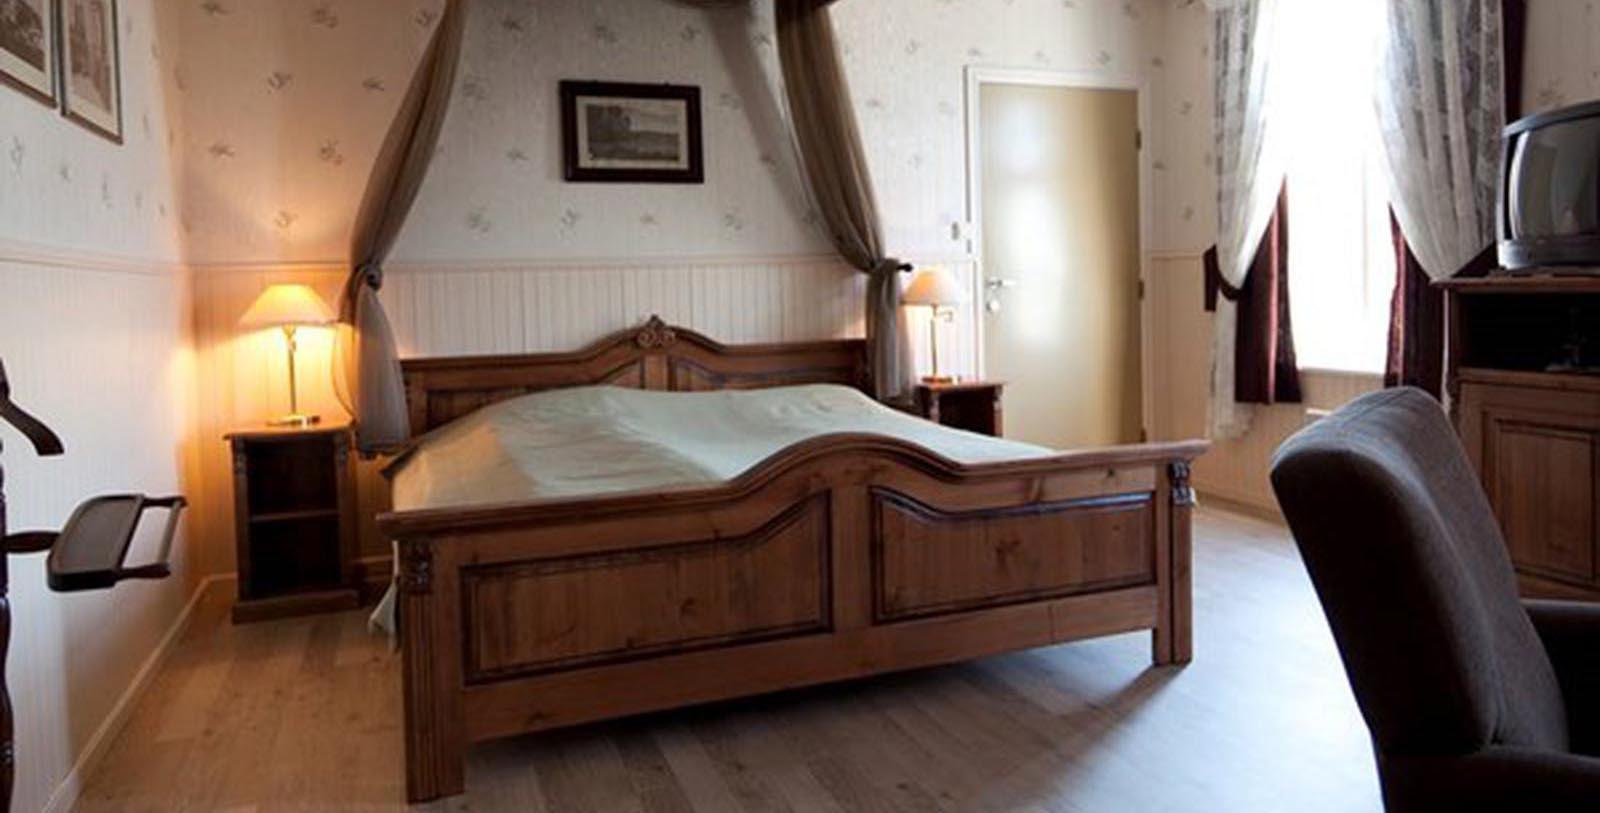 Image of Guestroom at Selbusjoen Hotel & Gjestegard, 1850, Member of Historic Hotels Worldwide, in Selbu, Norway, Location Map